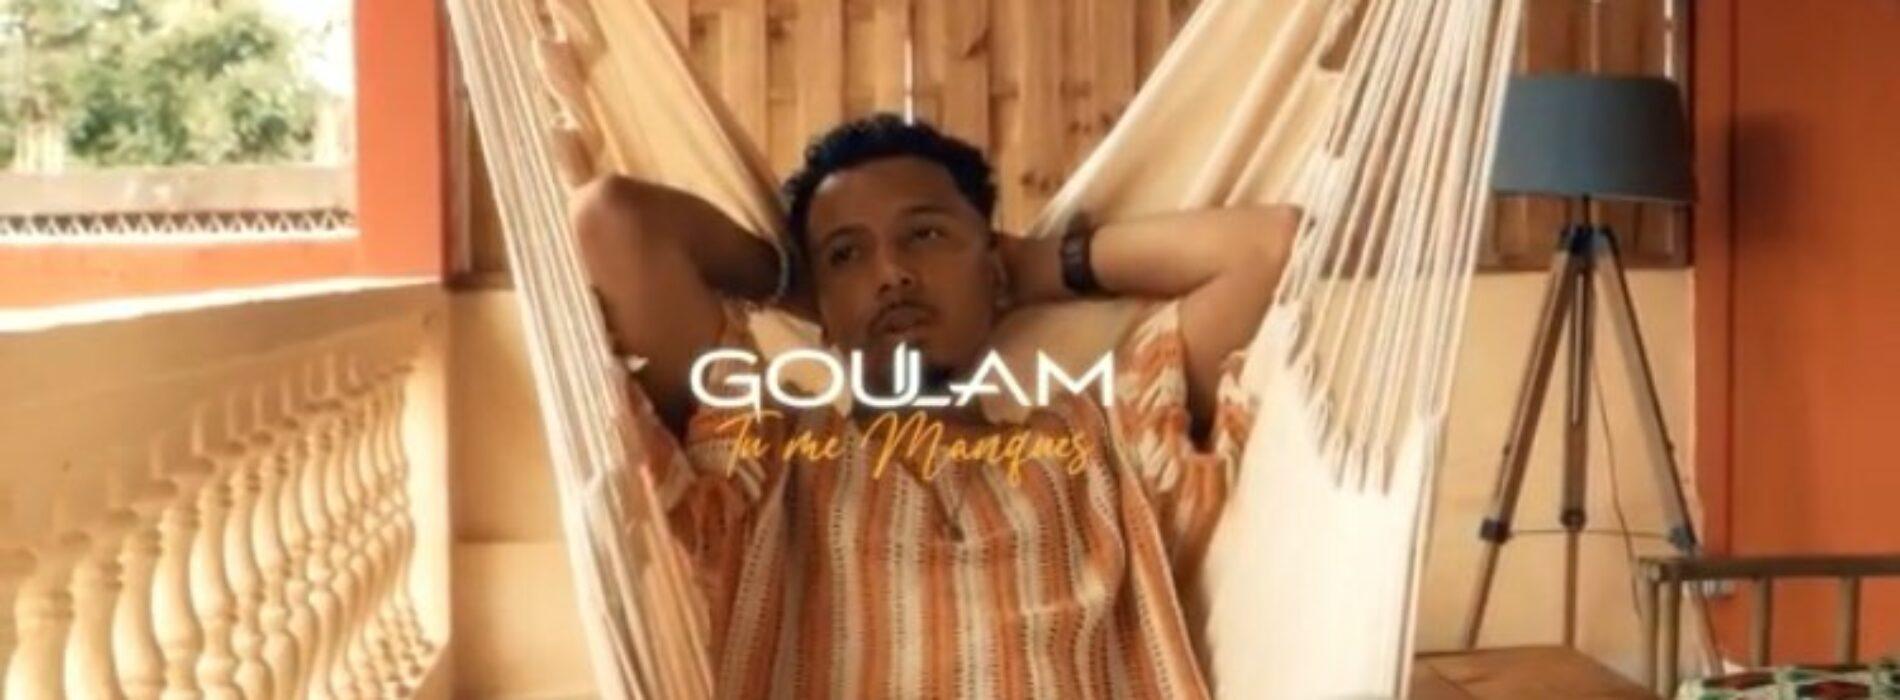 Goulam – Tu me manques (Clip Officiel) – Mai 2021